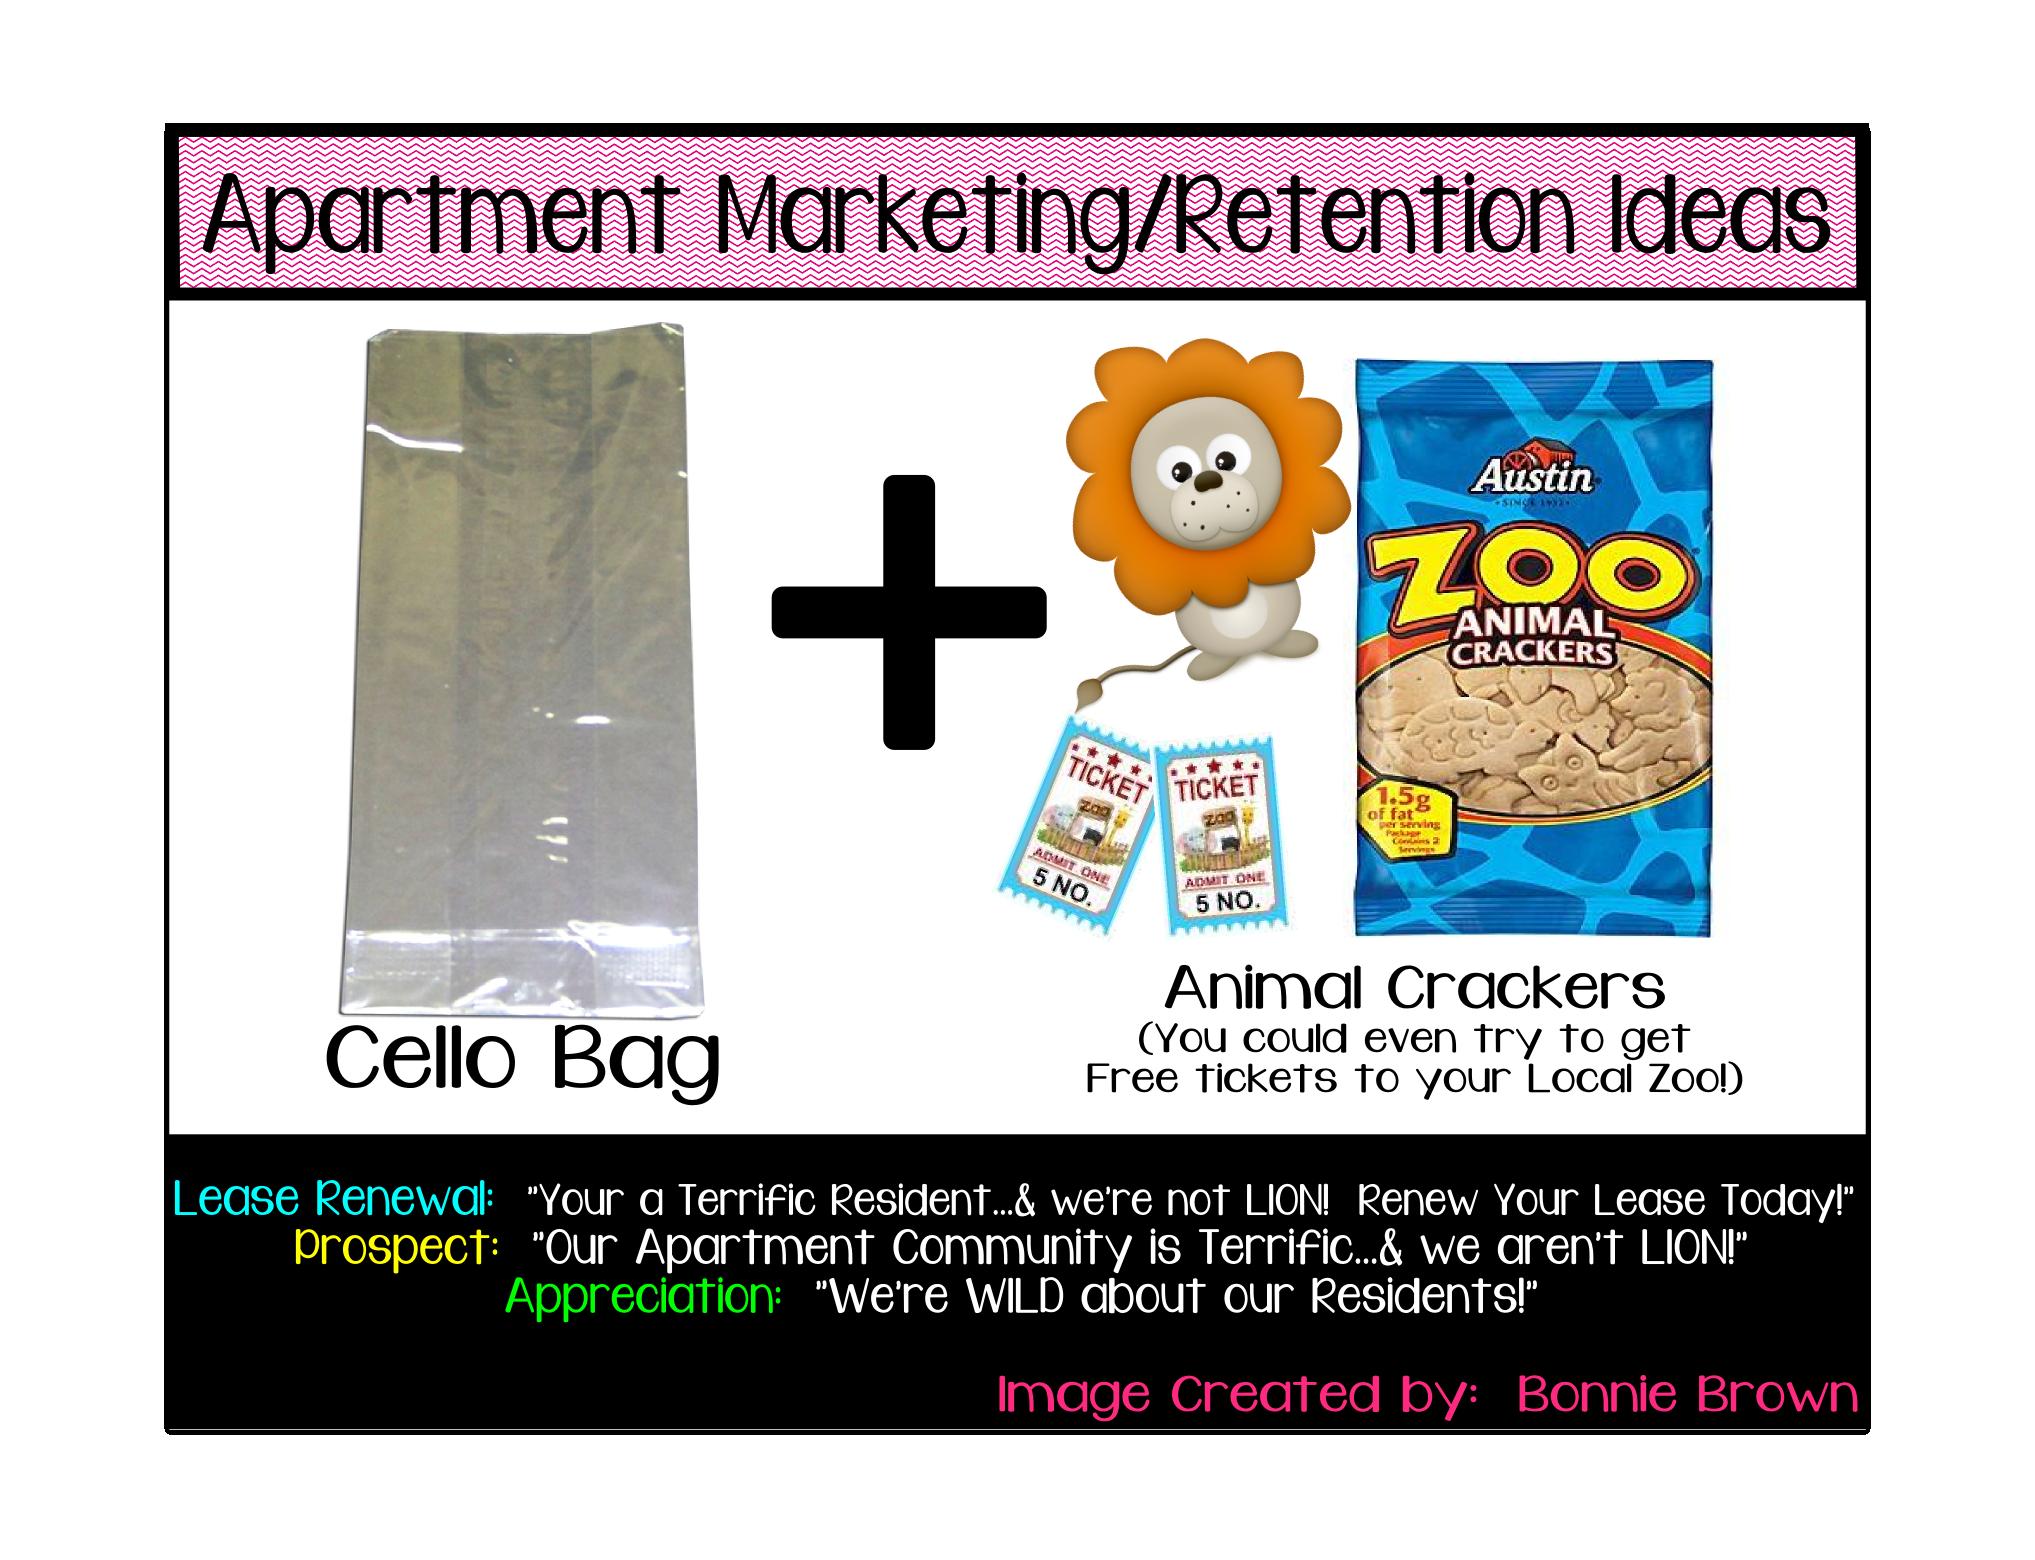 Apartment marketing retention ideas. Neighborhood clipart city layout